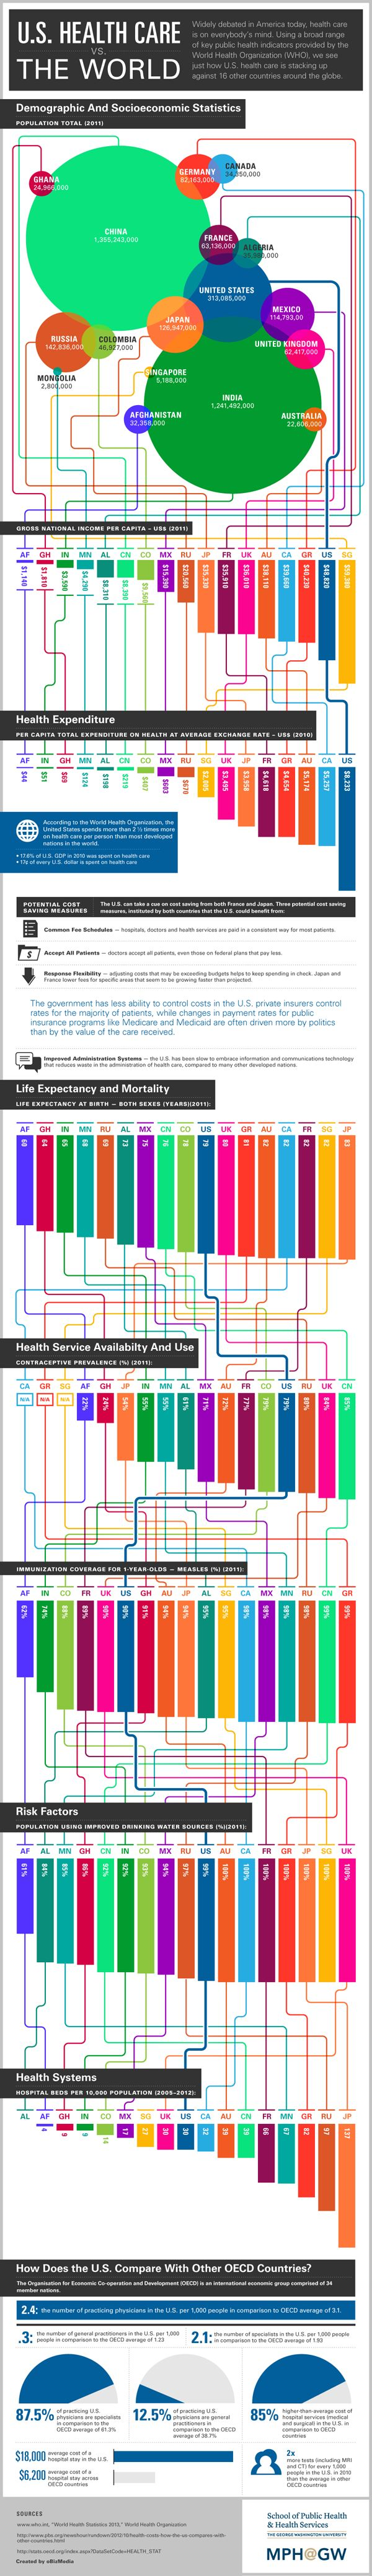 US Health Care vs The World